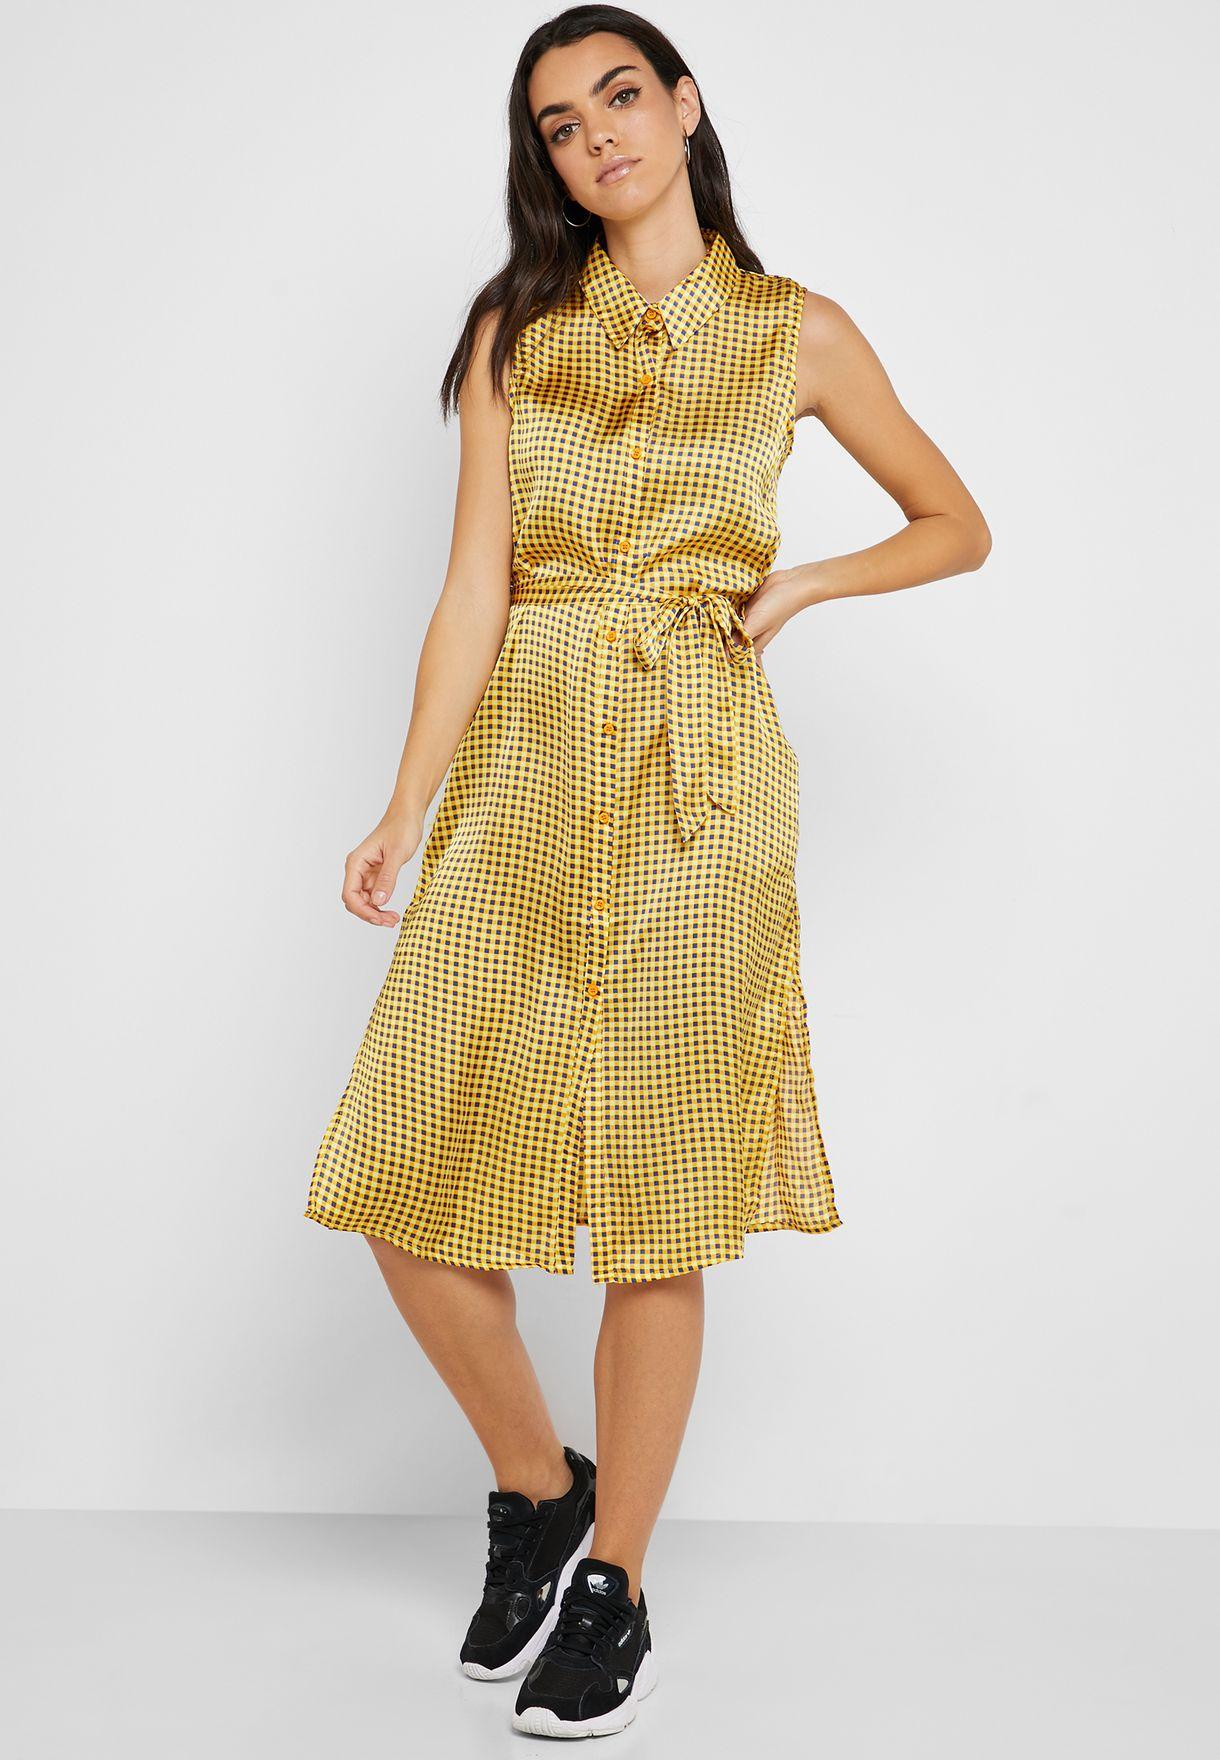 فستان بنمط قميص مع طبعات مربعات